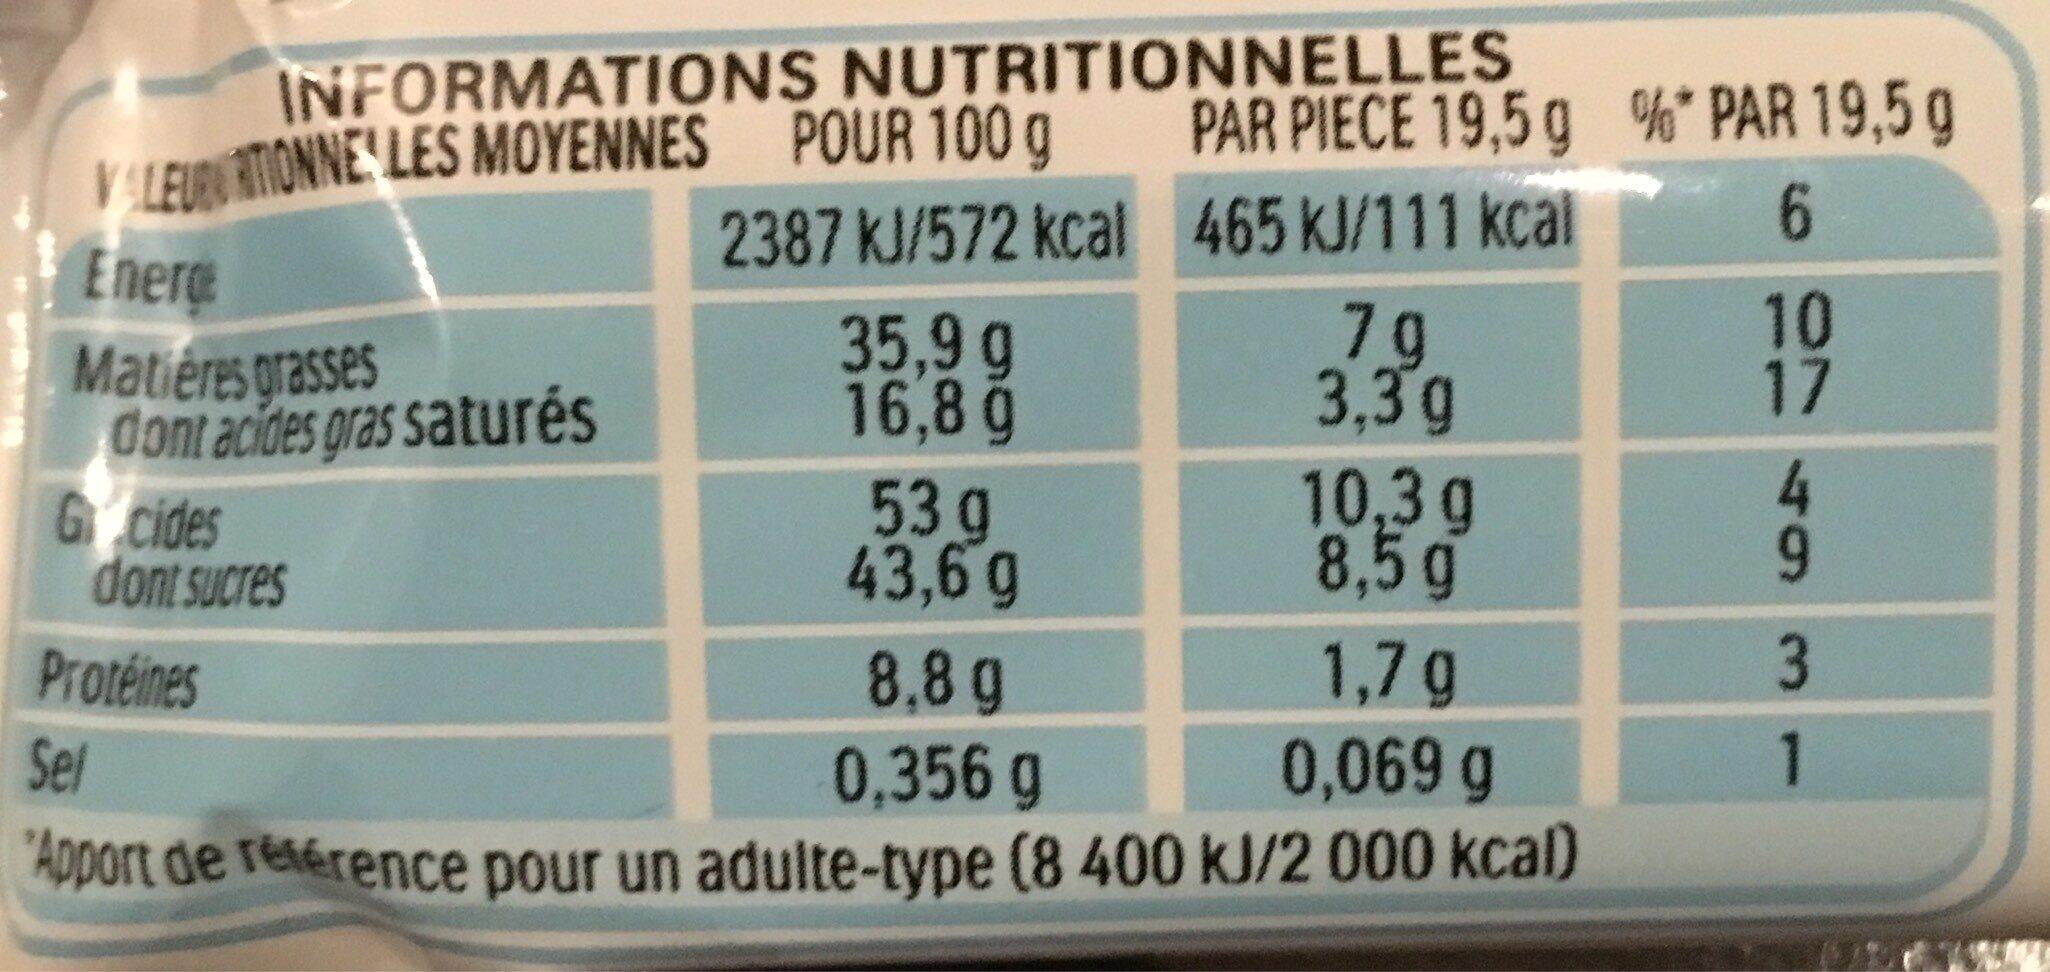 Kinder bueno white gaufrettes enrobees de chocolat blanc 8 x2 barres - Informations nutritionnelles - fr